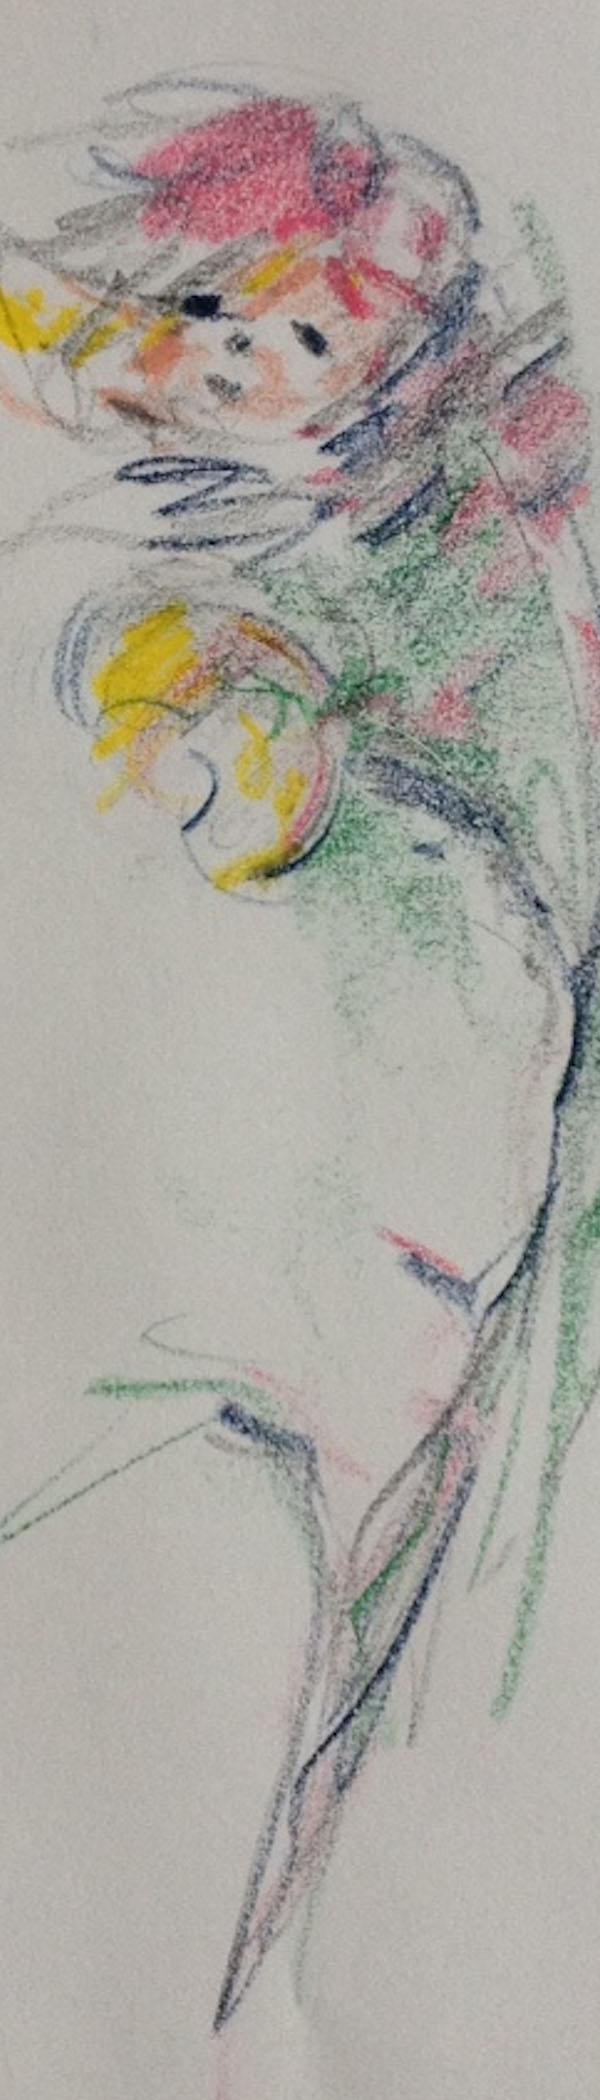 Lisa Winer